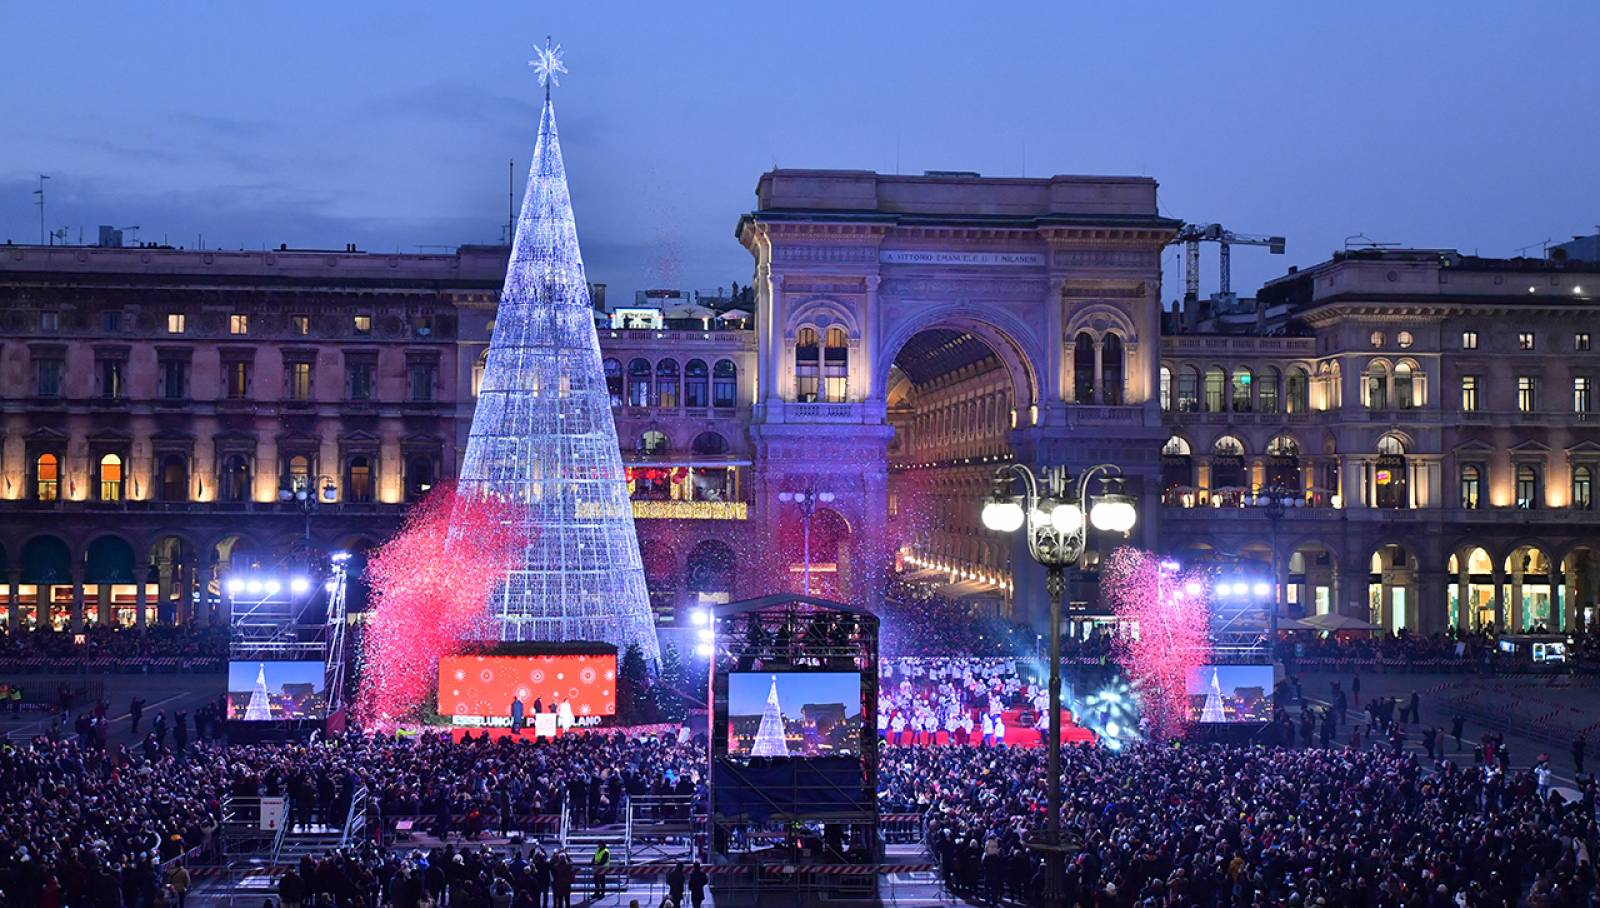 IGPDecaux Milano Piazza Duomo Albero di Natale 2019 Esselunga